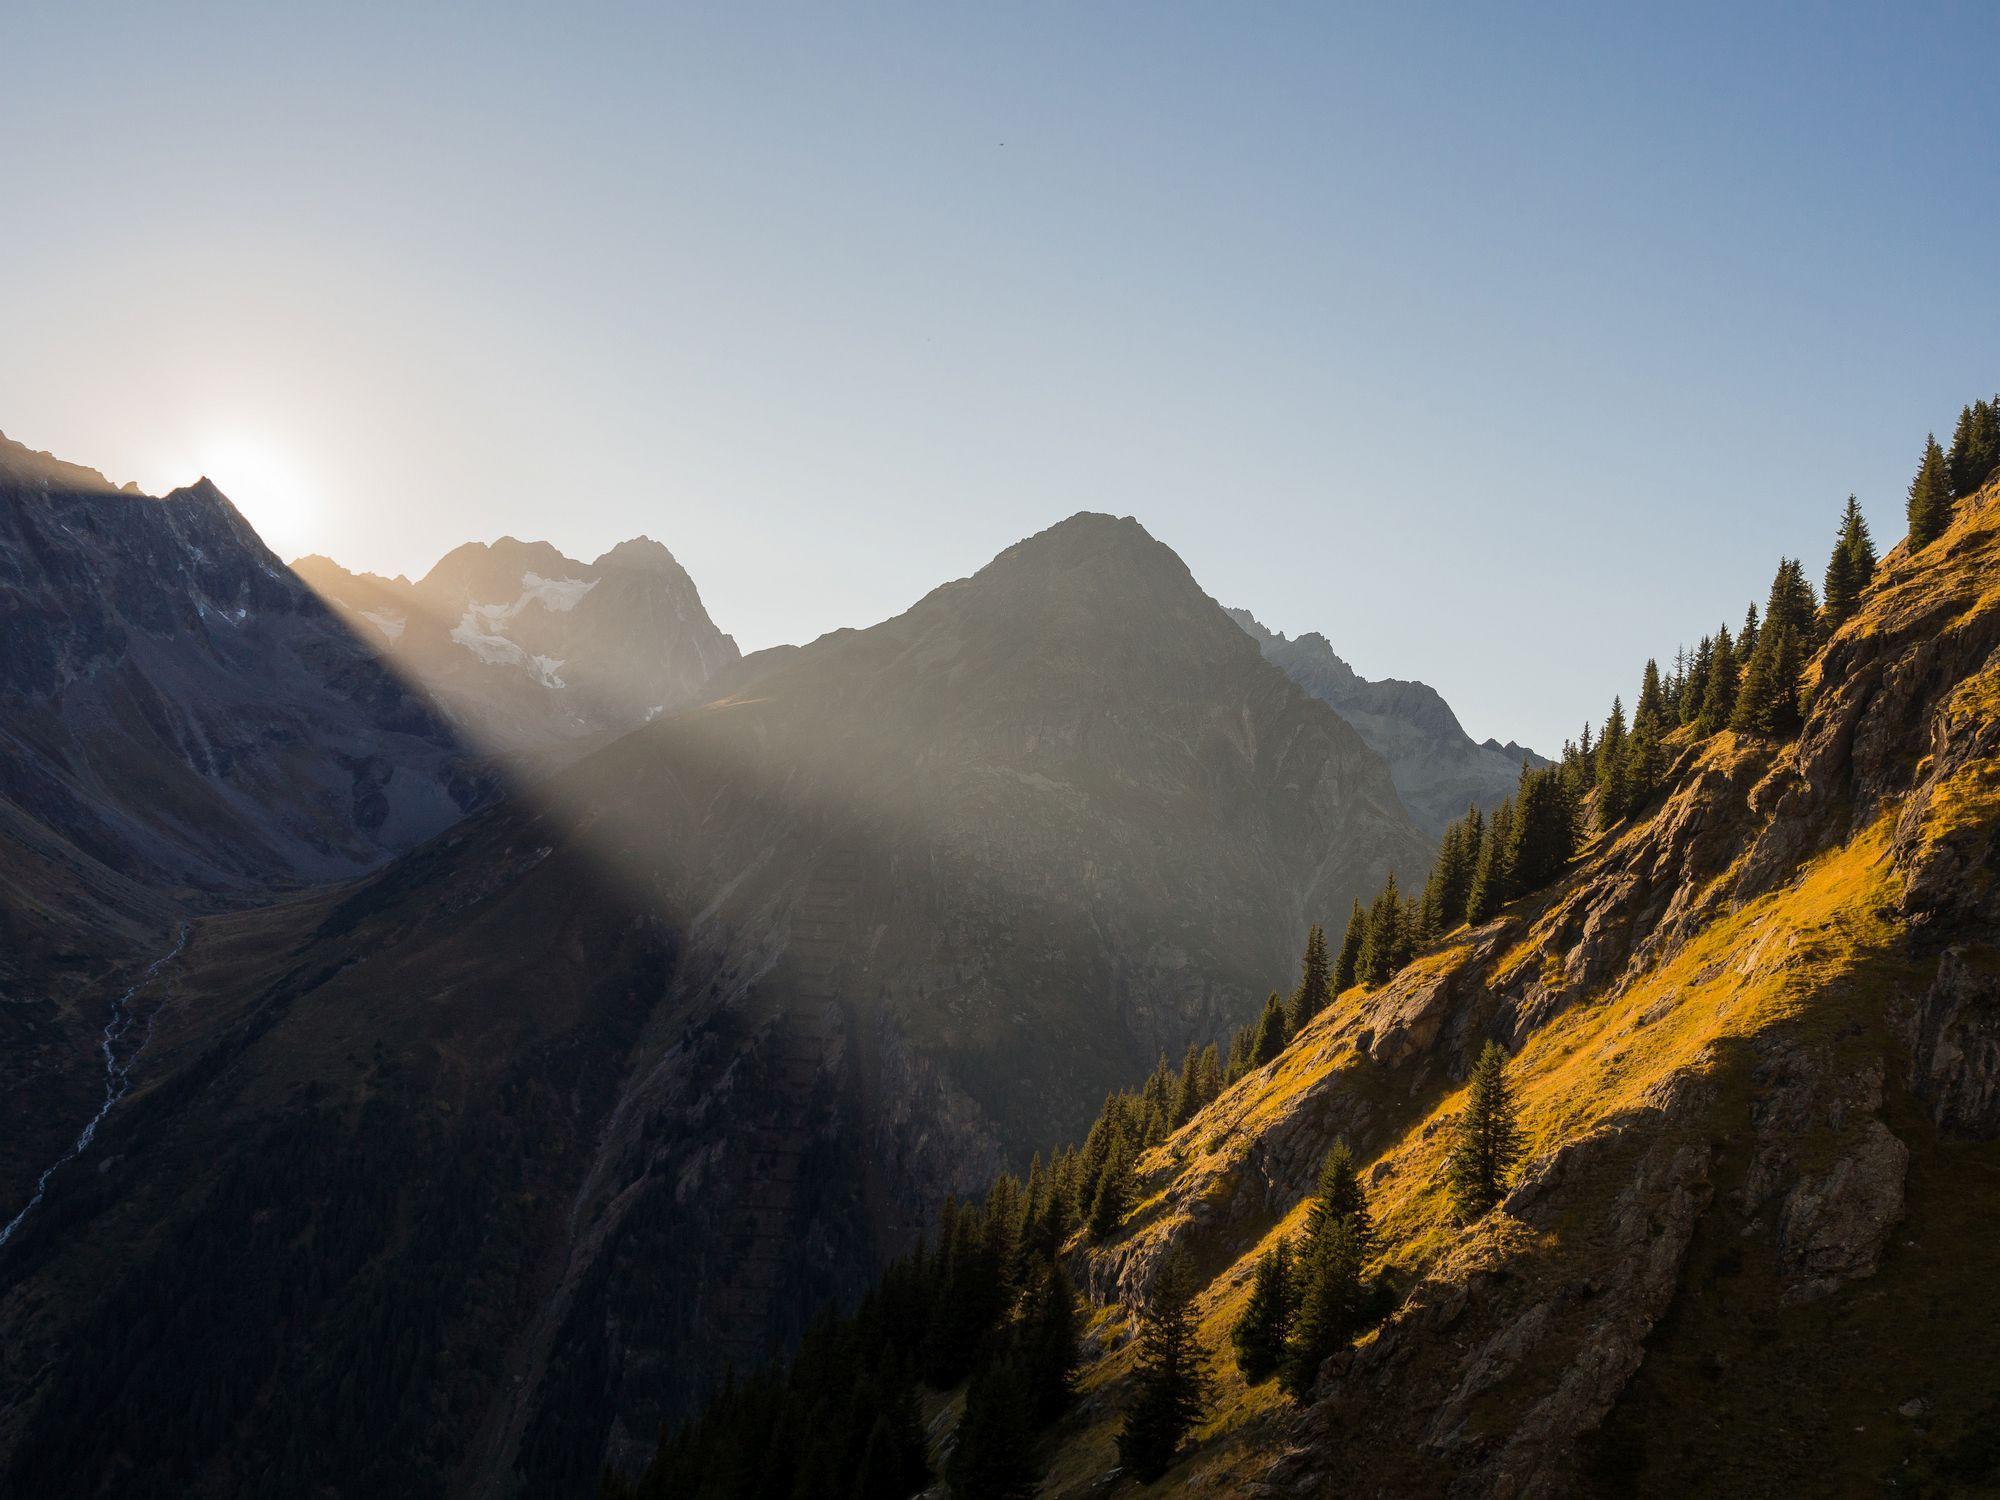 Abendsonne in den Bergen